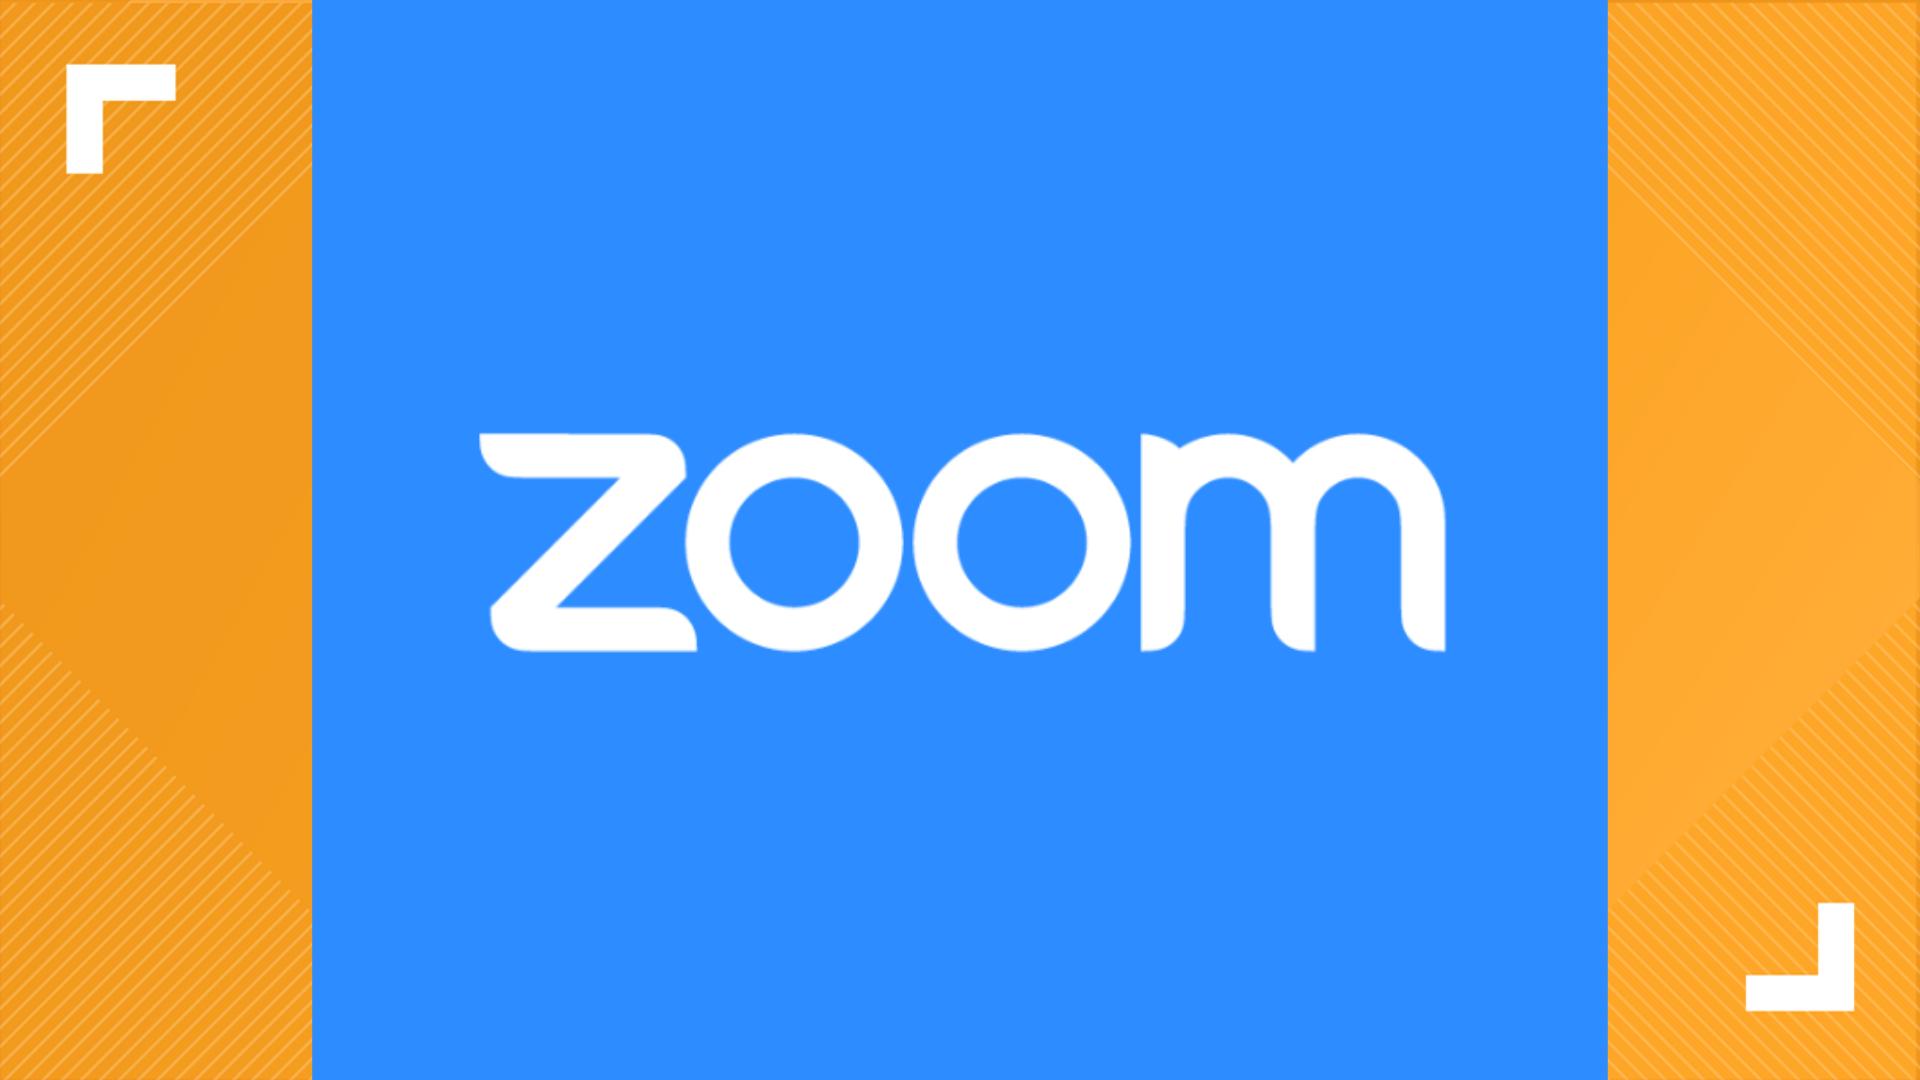 Zoom narys nera kenksmingas